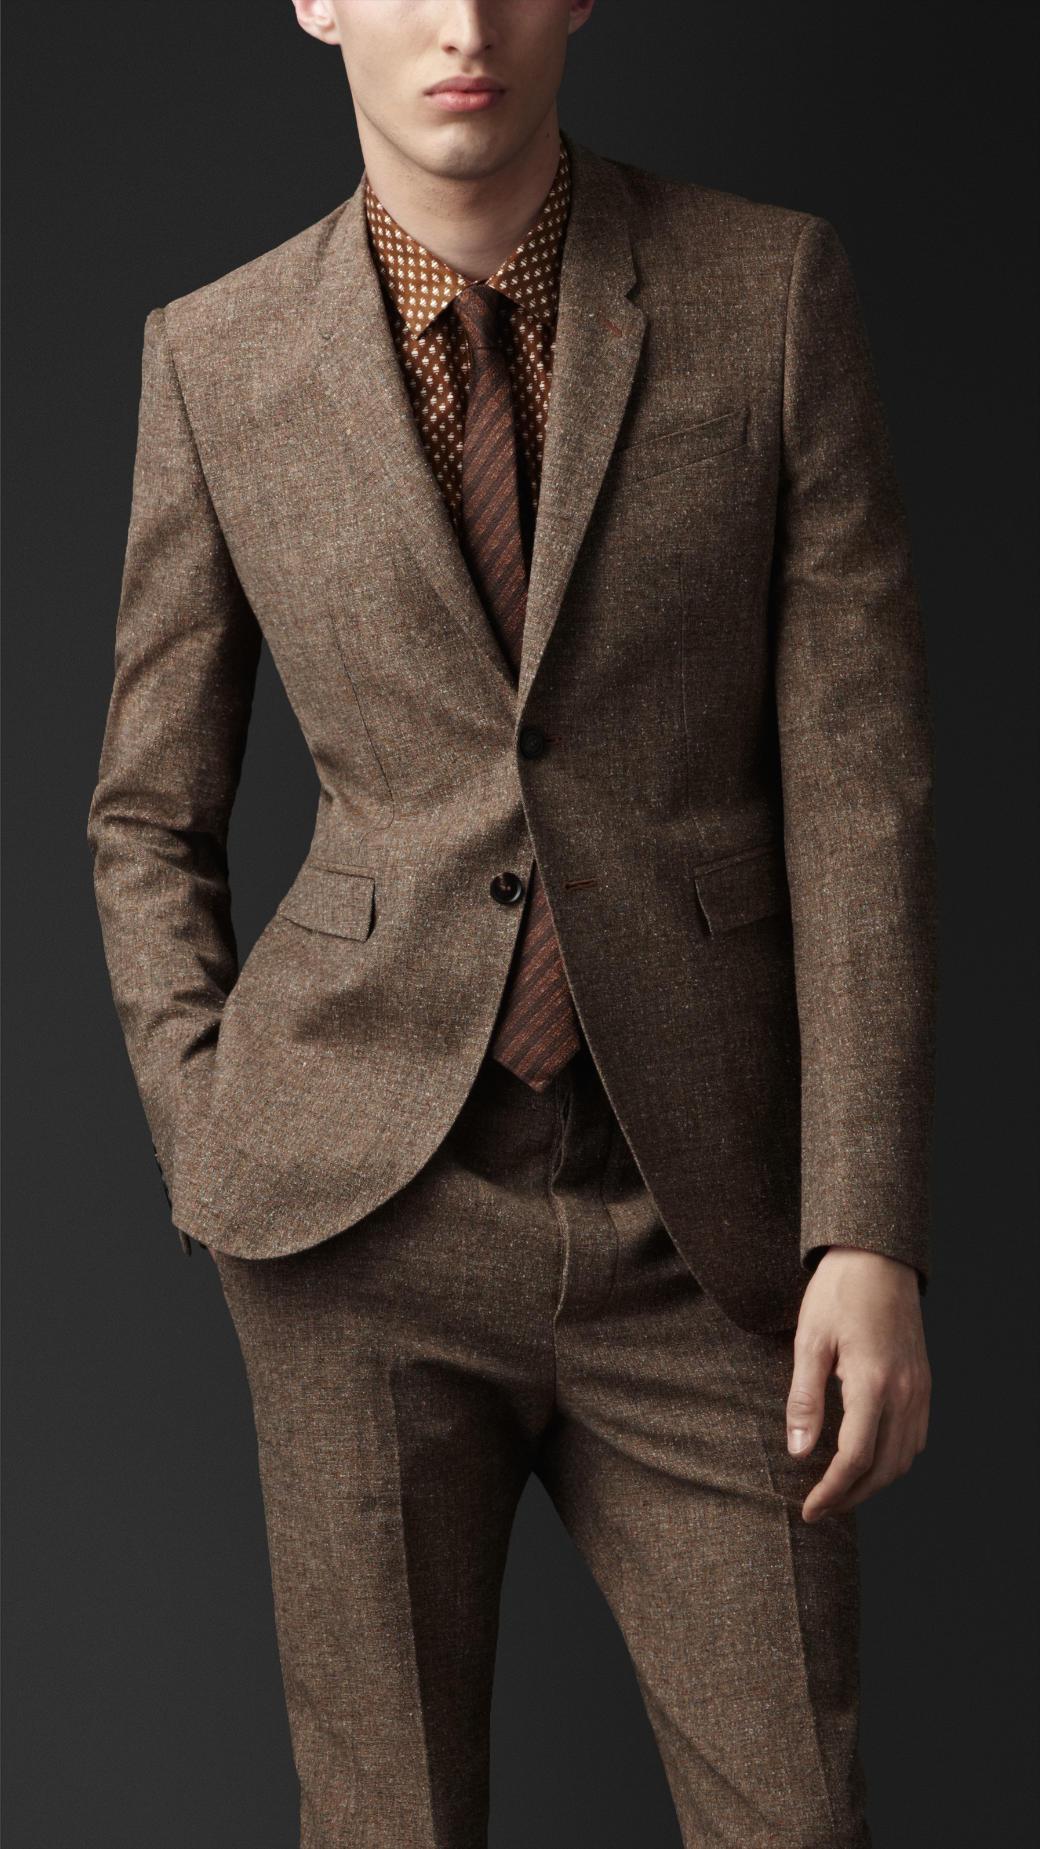 Burberry Prorsum Slim Fit Tweed Jacket In Brown For Men